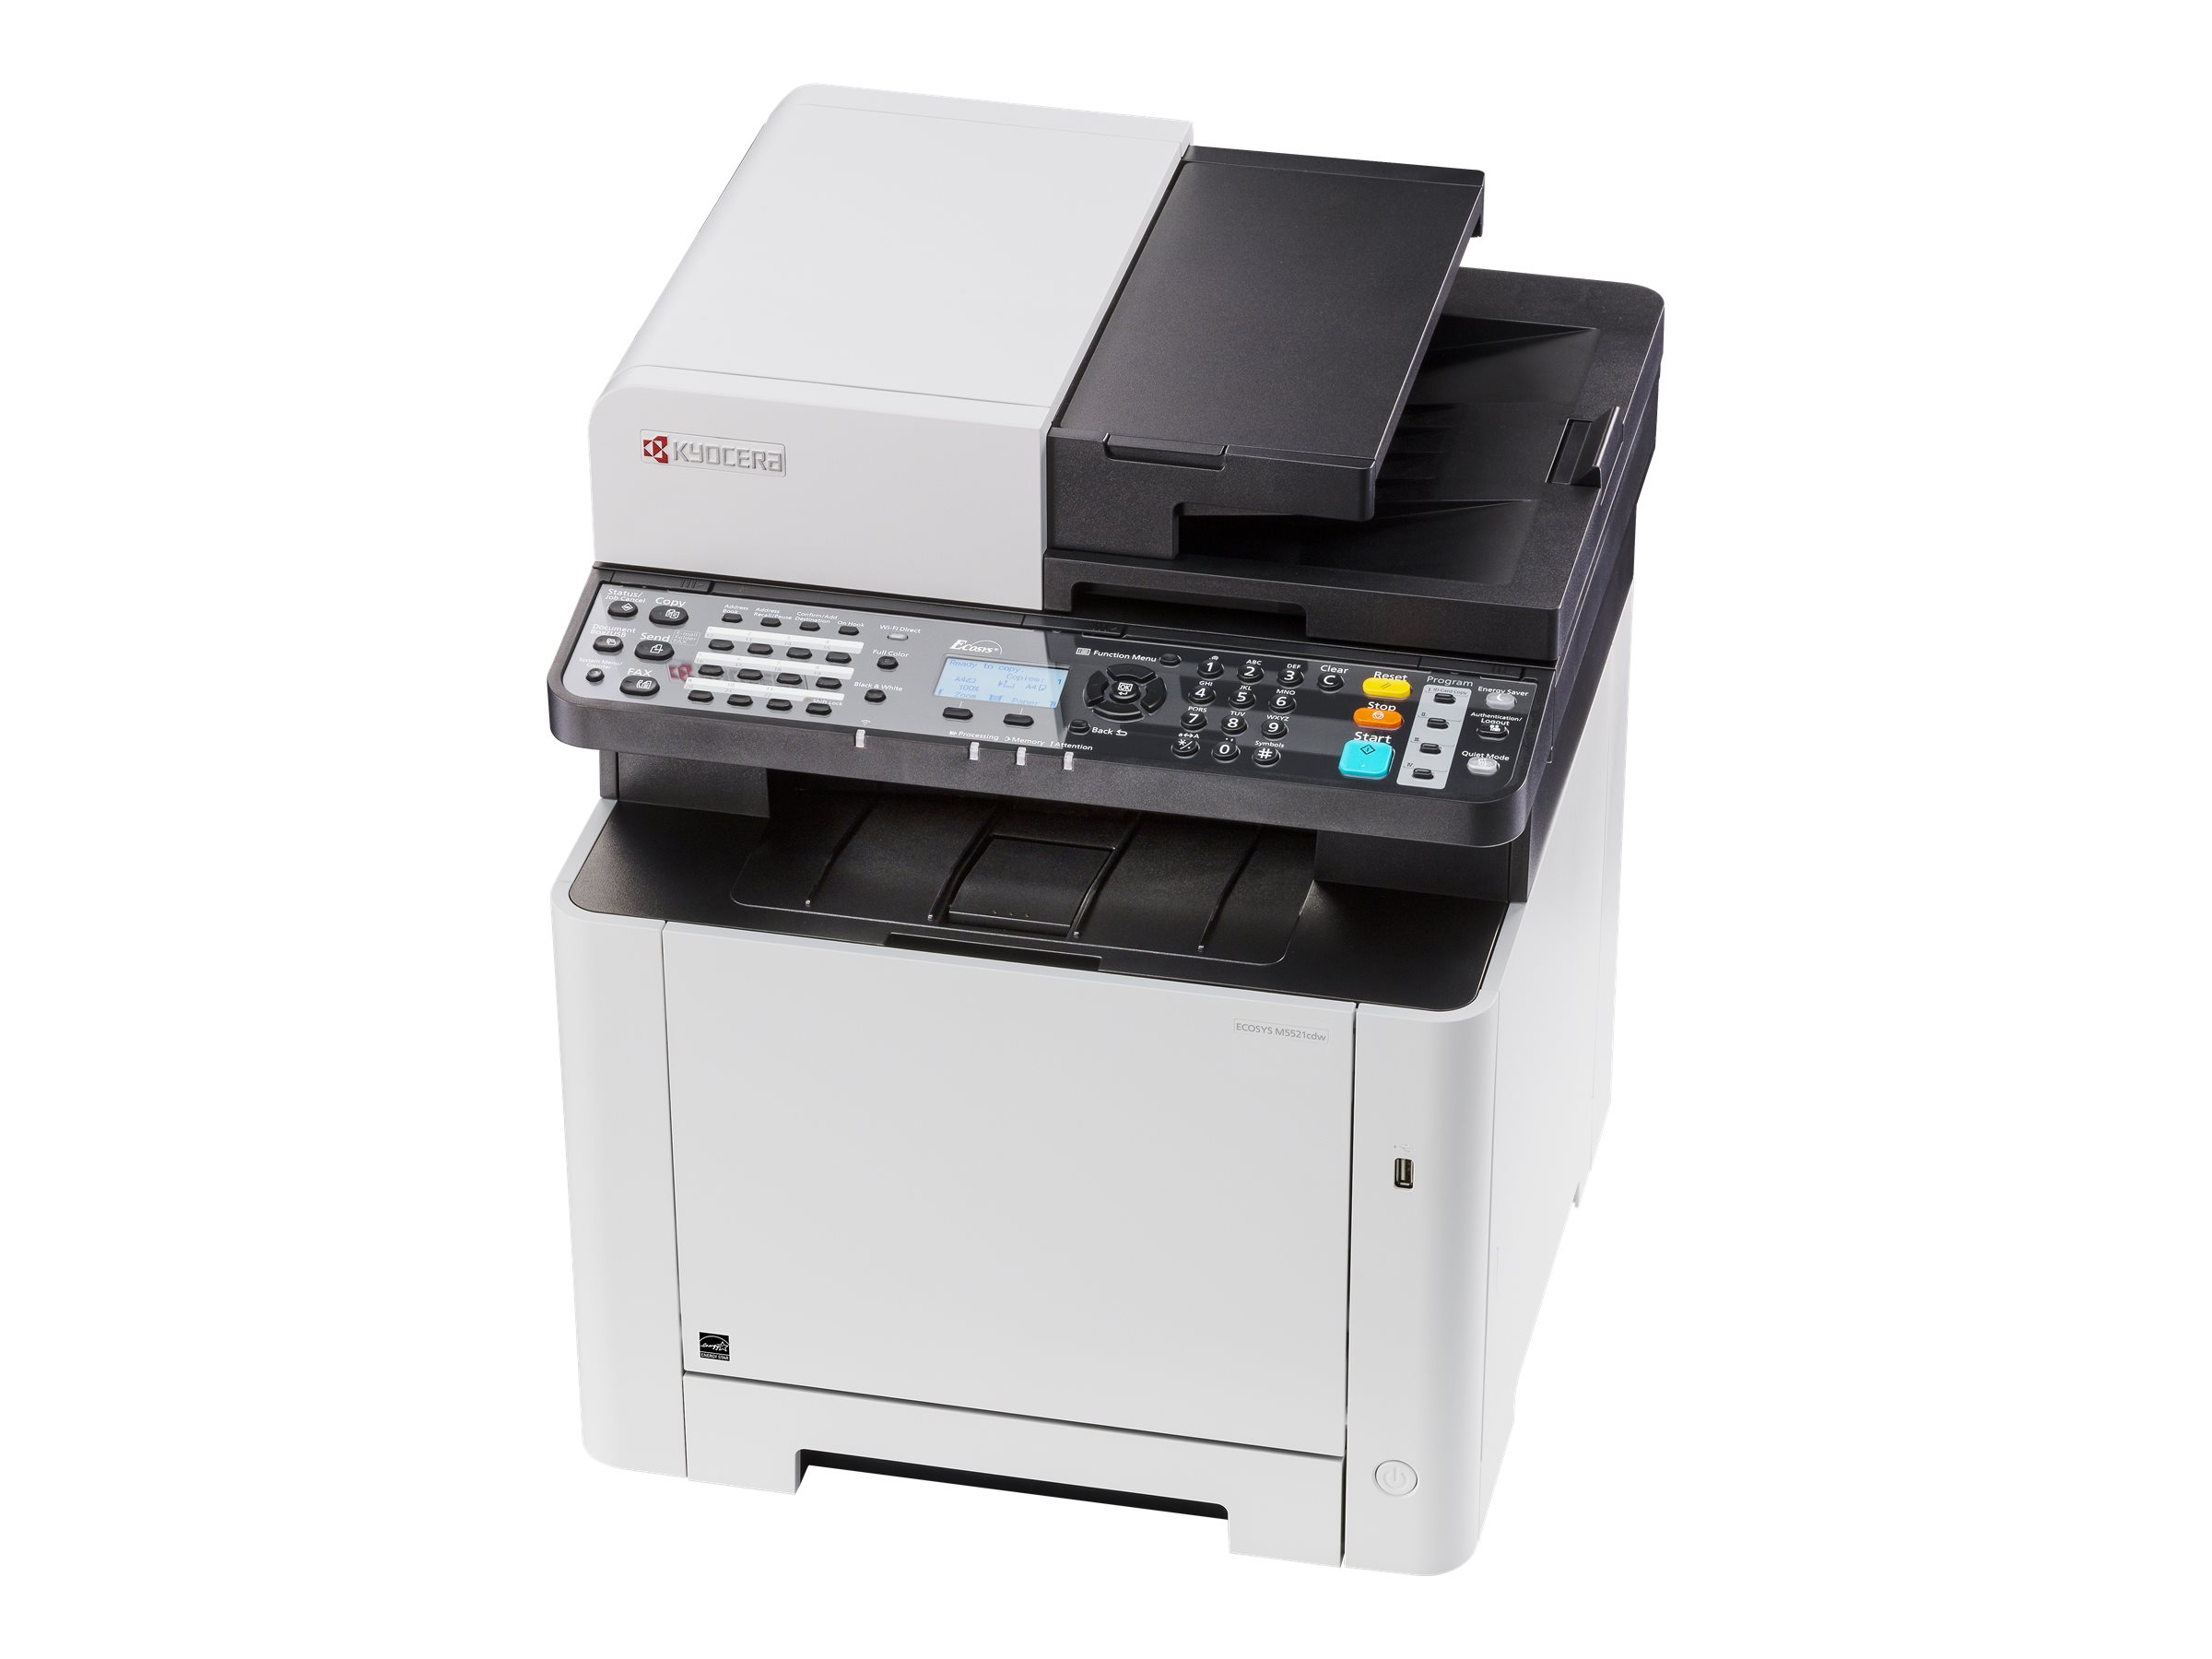 Kyocera ECOSYS M5521cdw - Multifunktionsdrucker - Farbe - Laser - Legal (216 x 356 mm)/